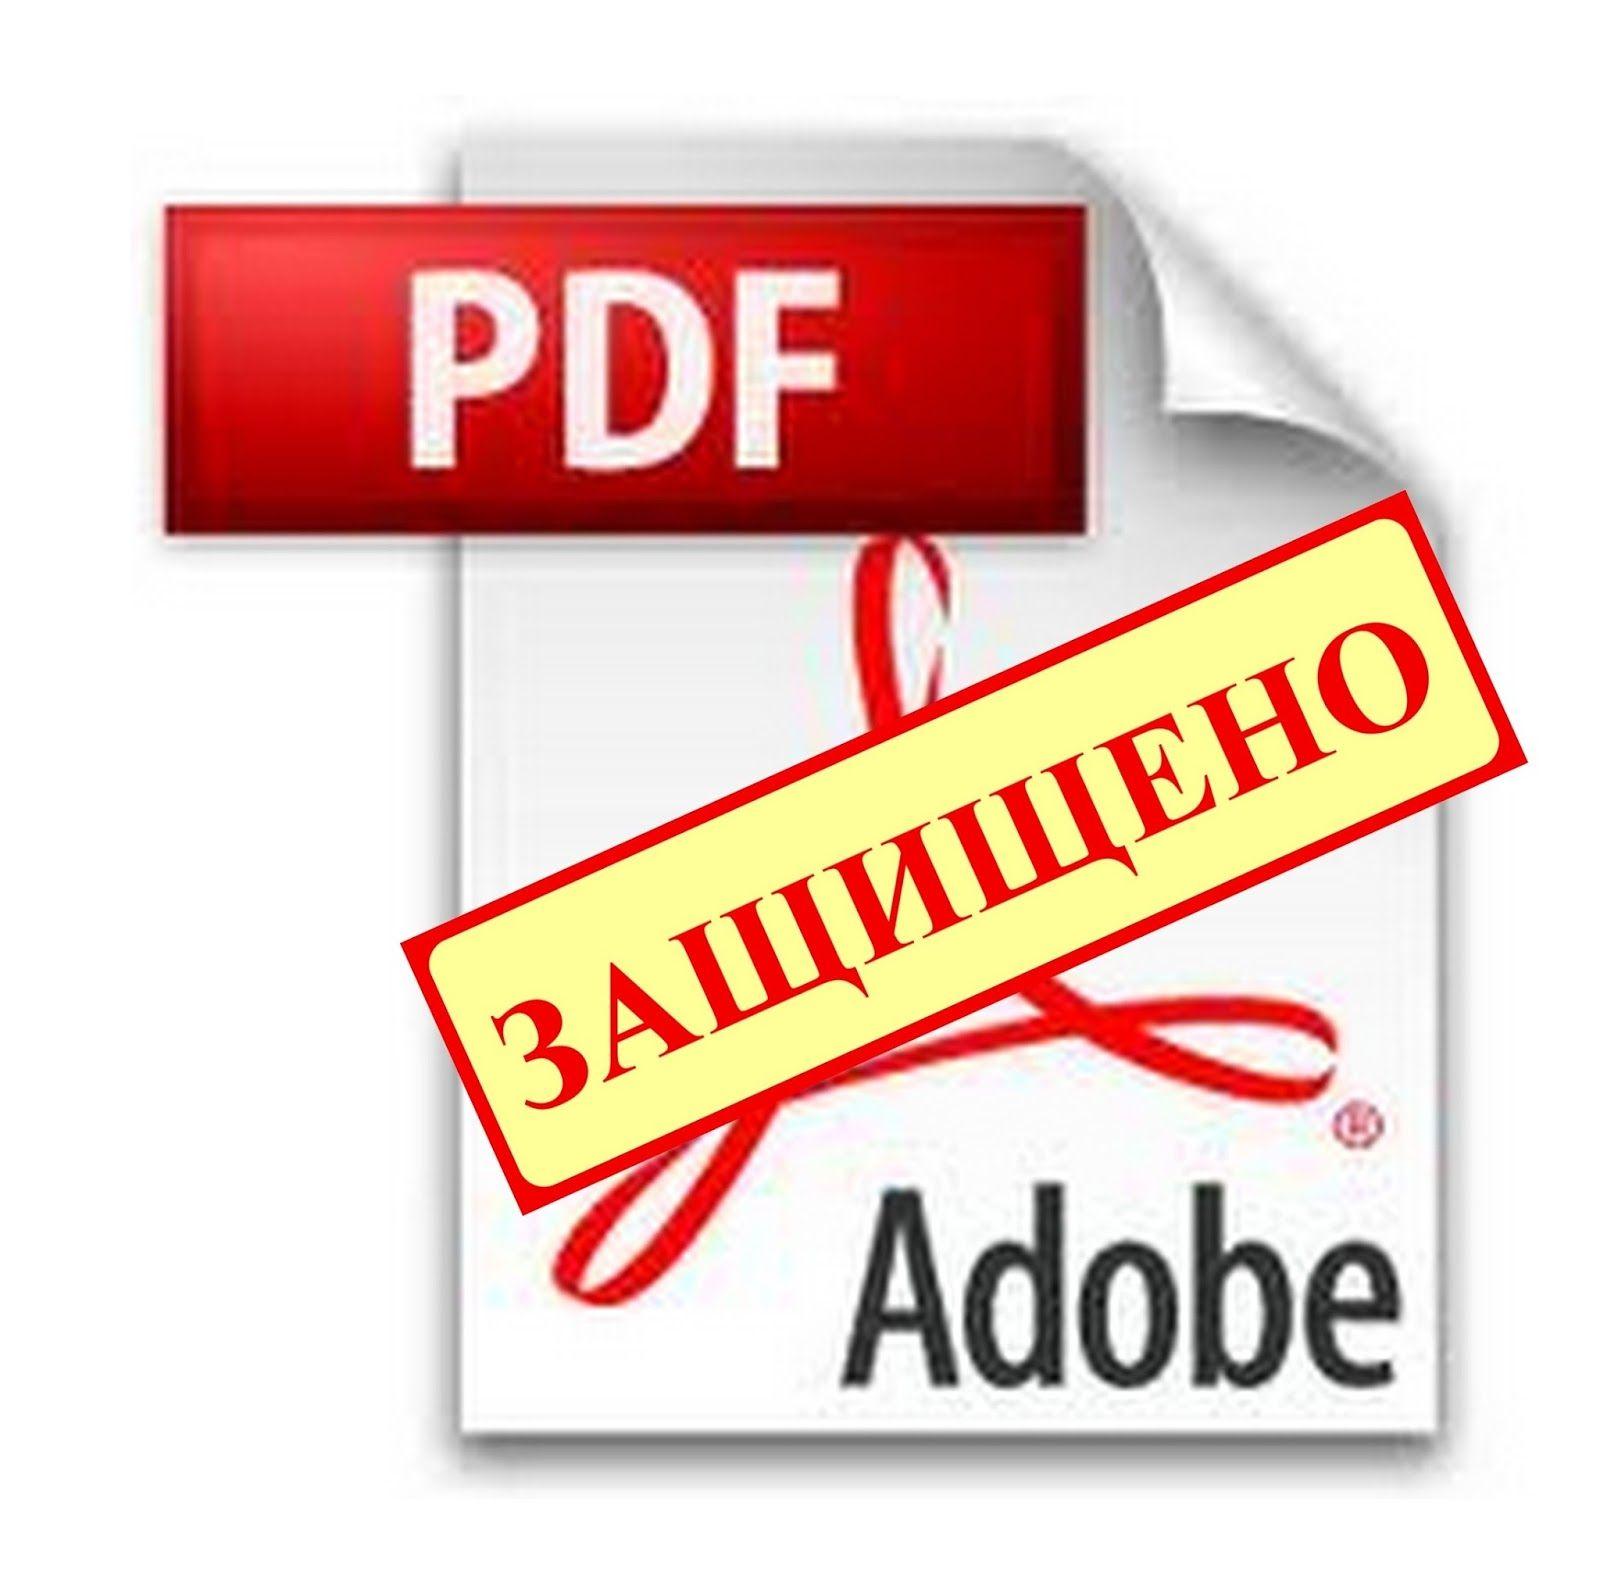 Как защитить пдф файл | БРБ - Блог ради блога | Блог ...